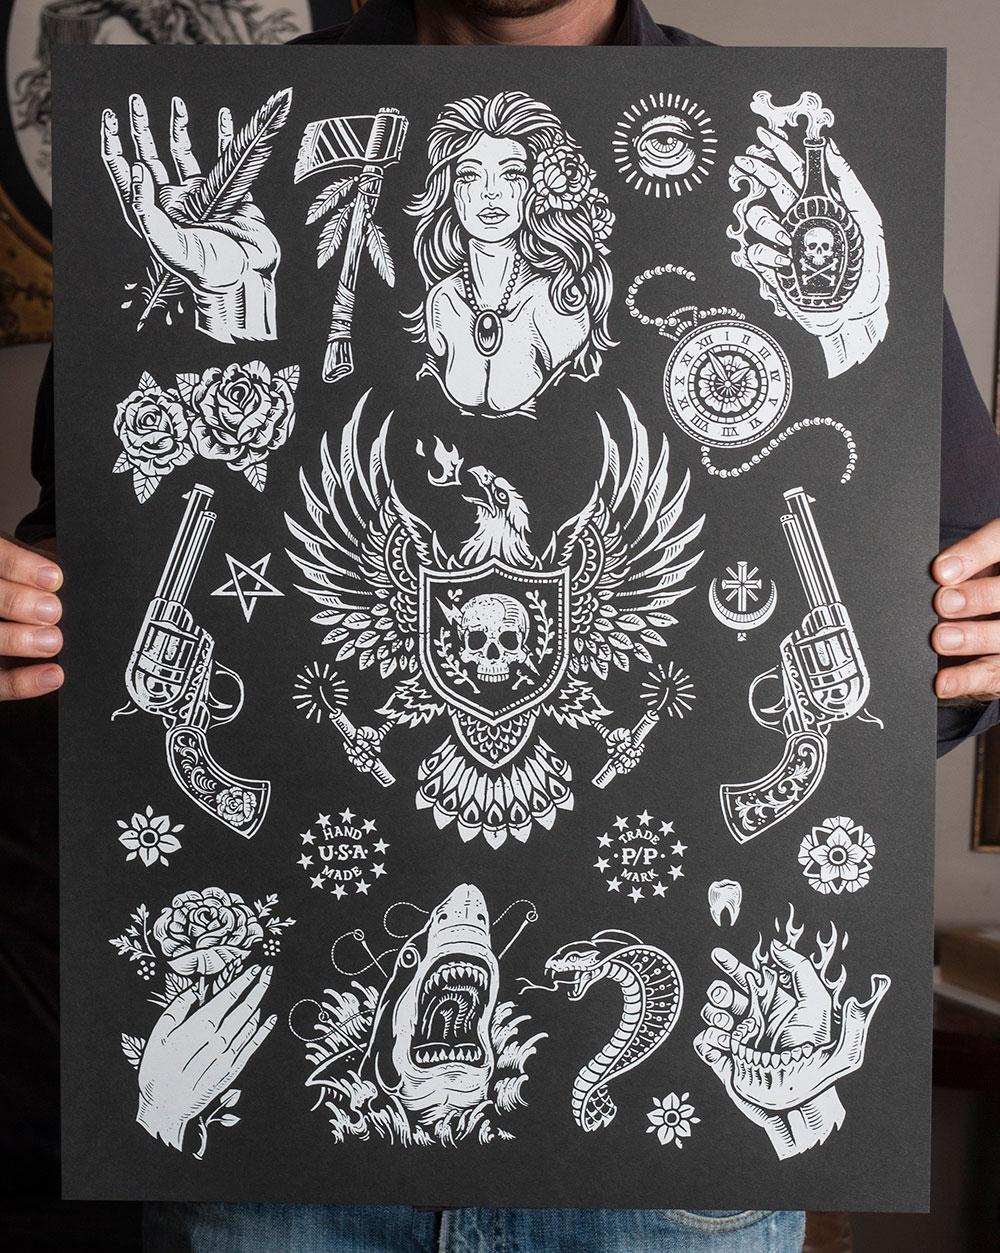 Free Tattoo Flash Designs To Print